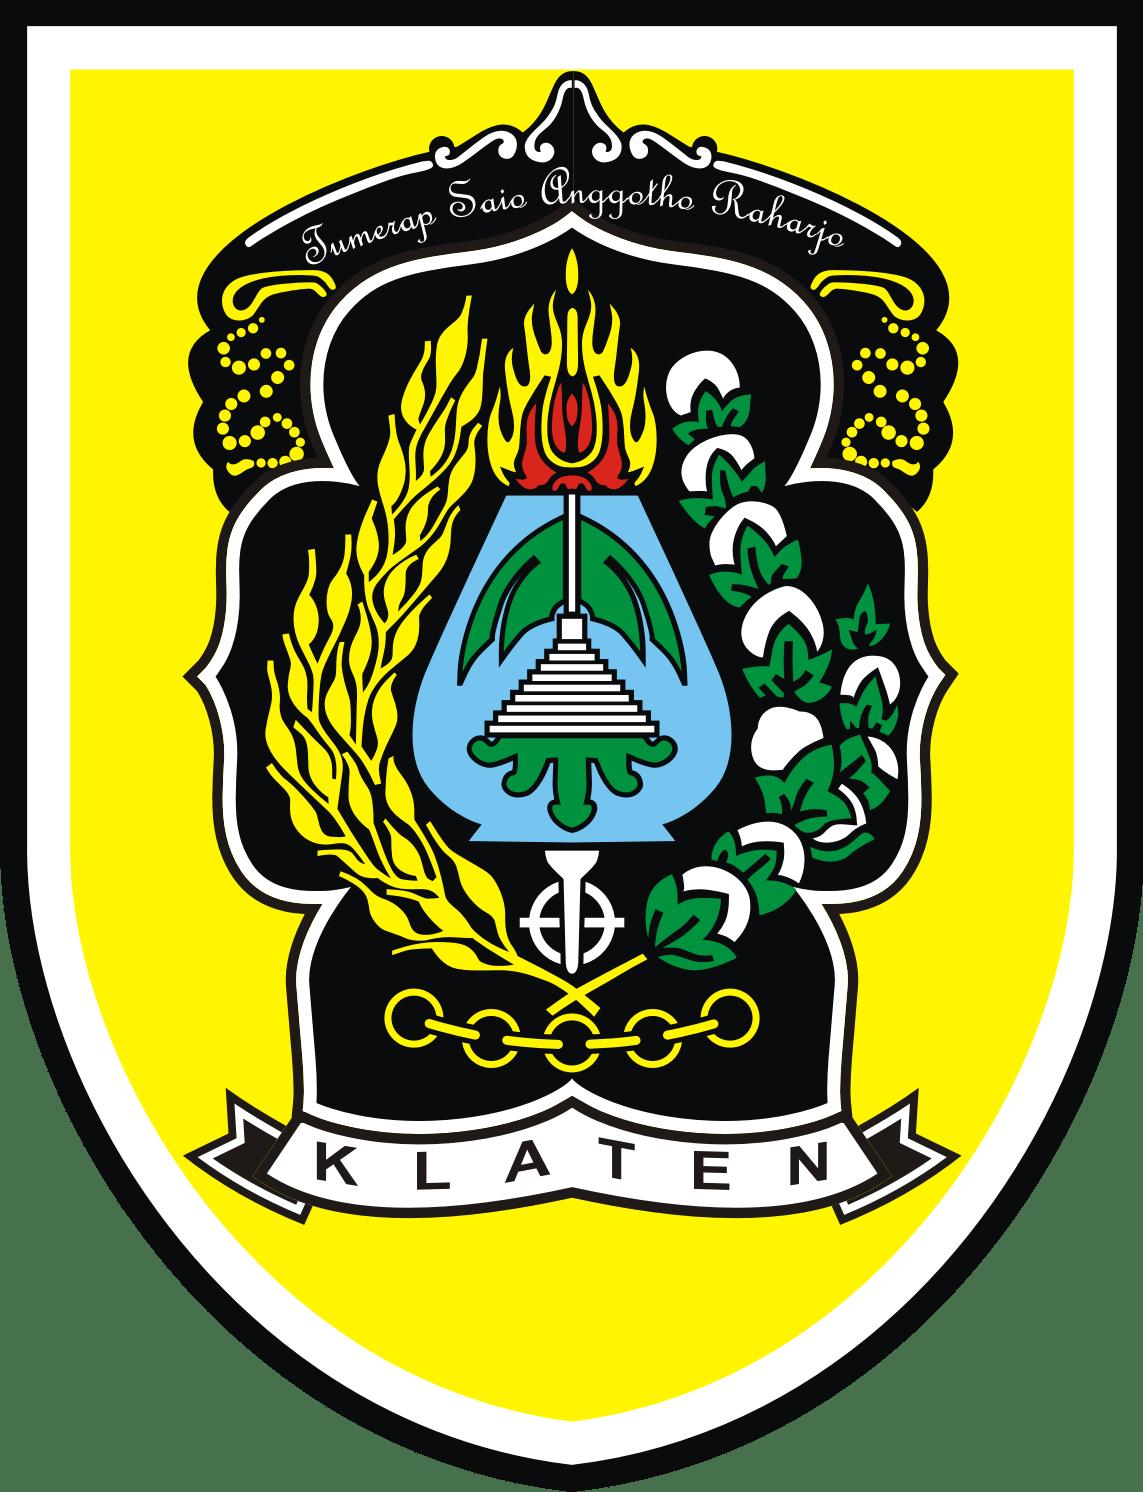 Logo Pemda Png : pemda, File:LOGO, KABUPATEN, KLATEN.png, Wikimedia, Commons